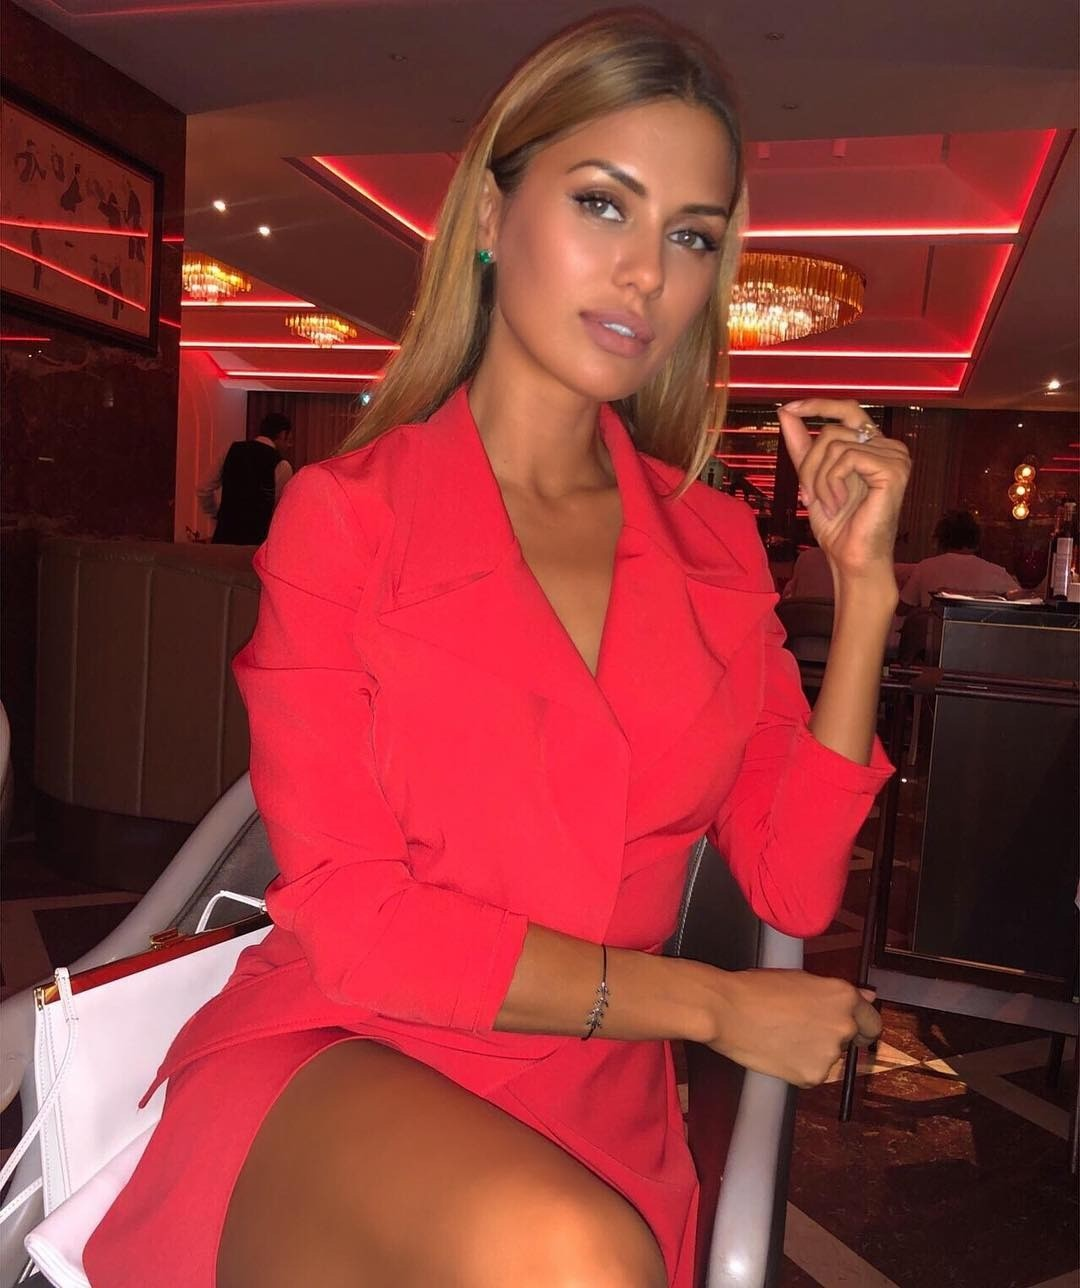 Викторию Боню подозревают в аренде букетов для фото